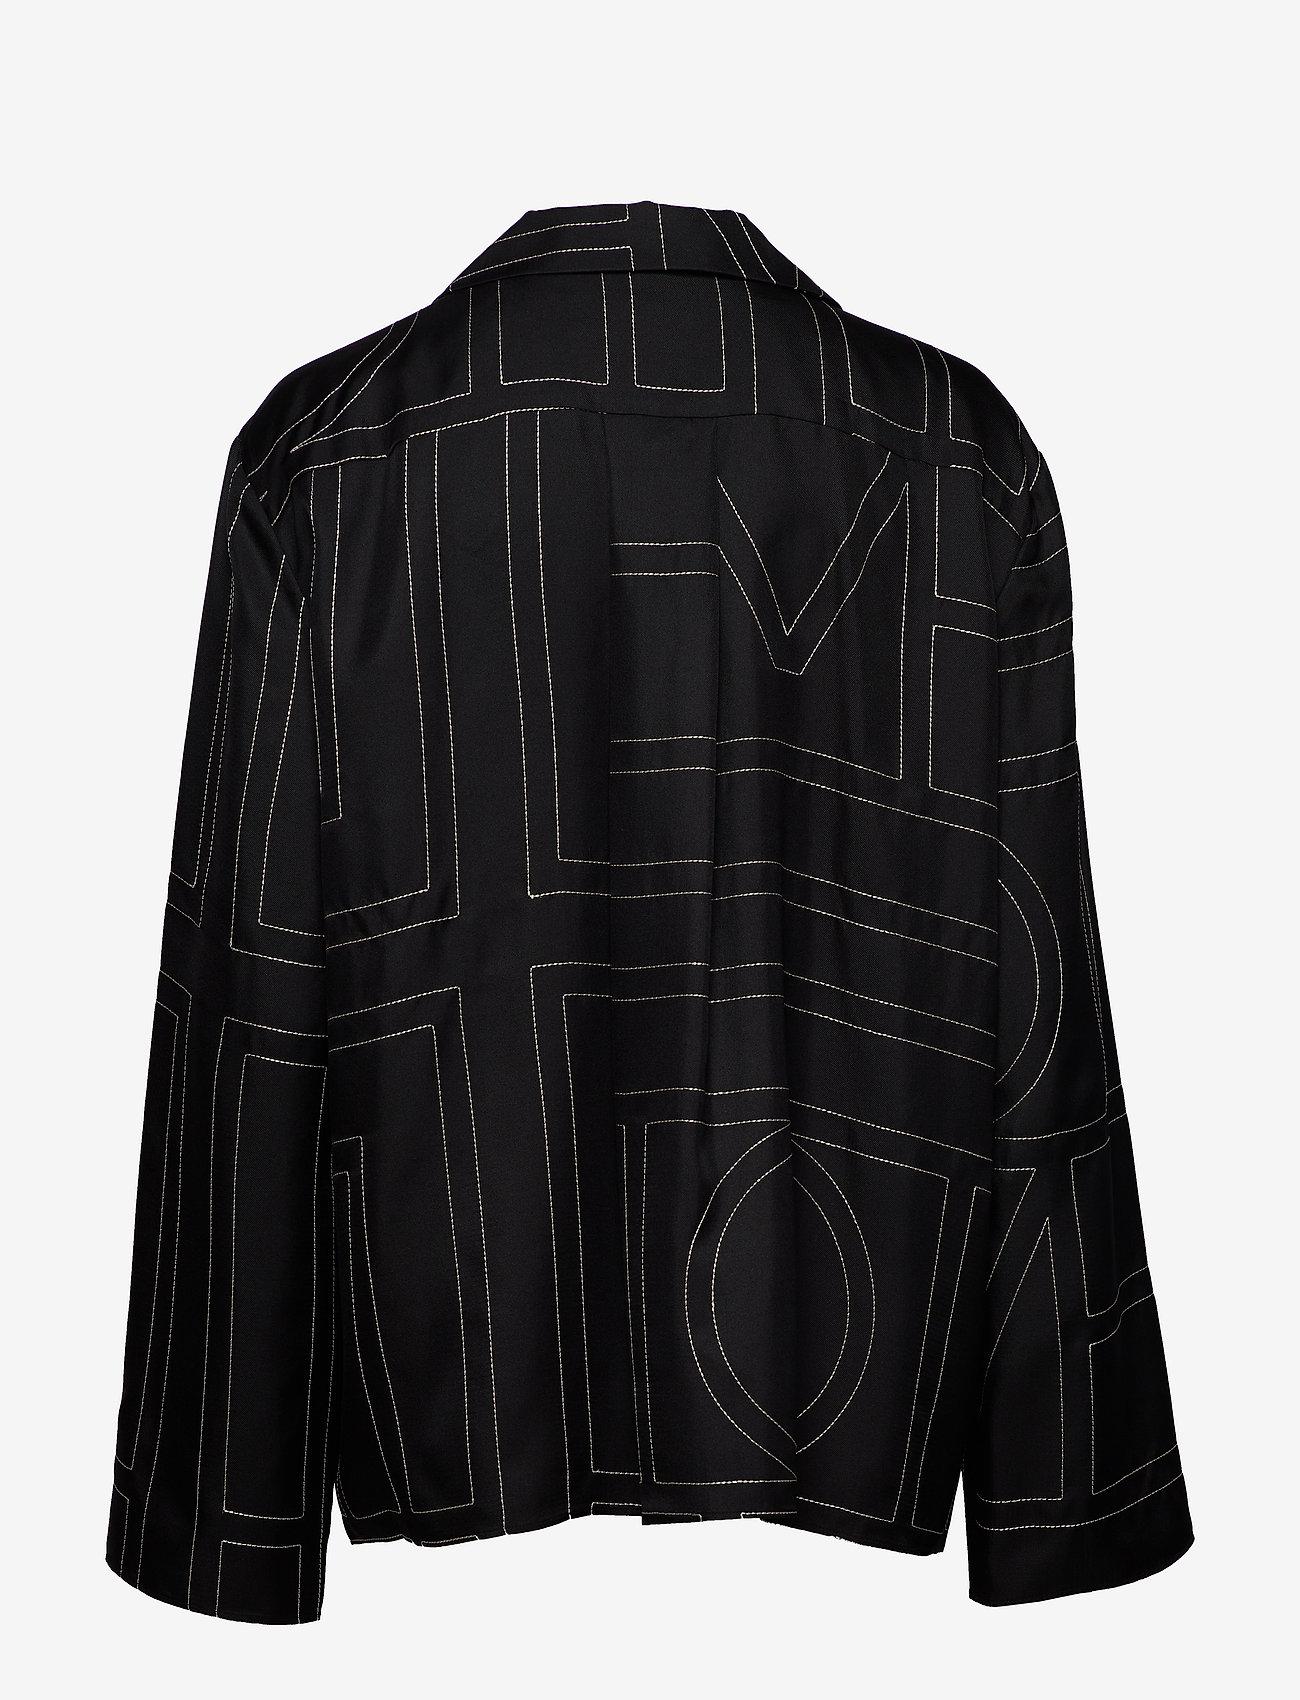 Sanville (Black Monogram 925) - Totême yFYNB0